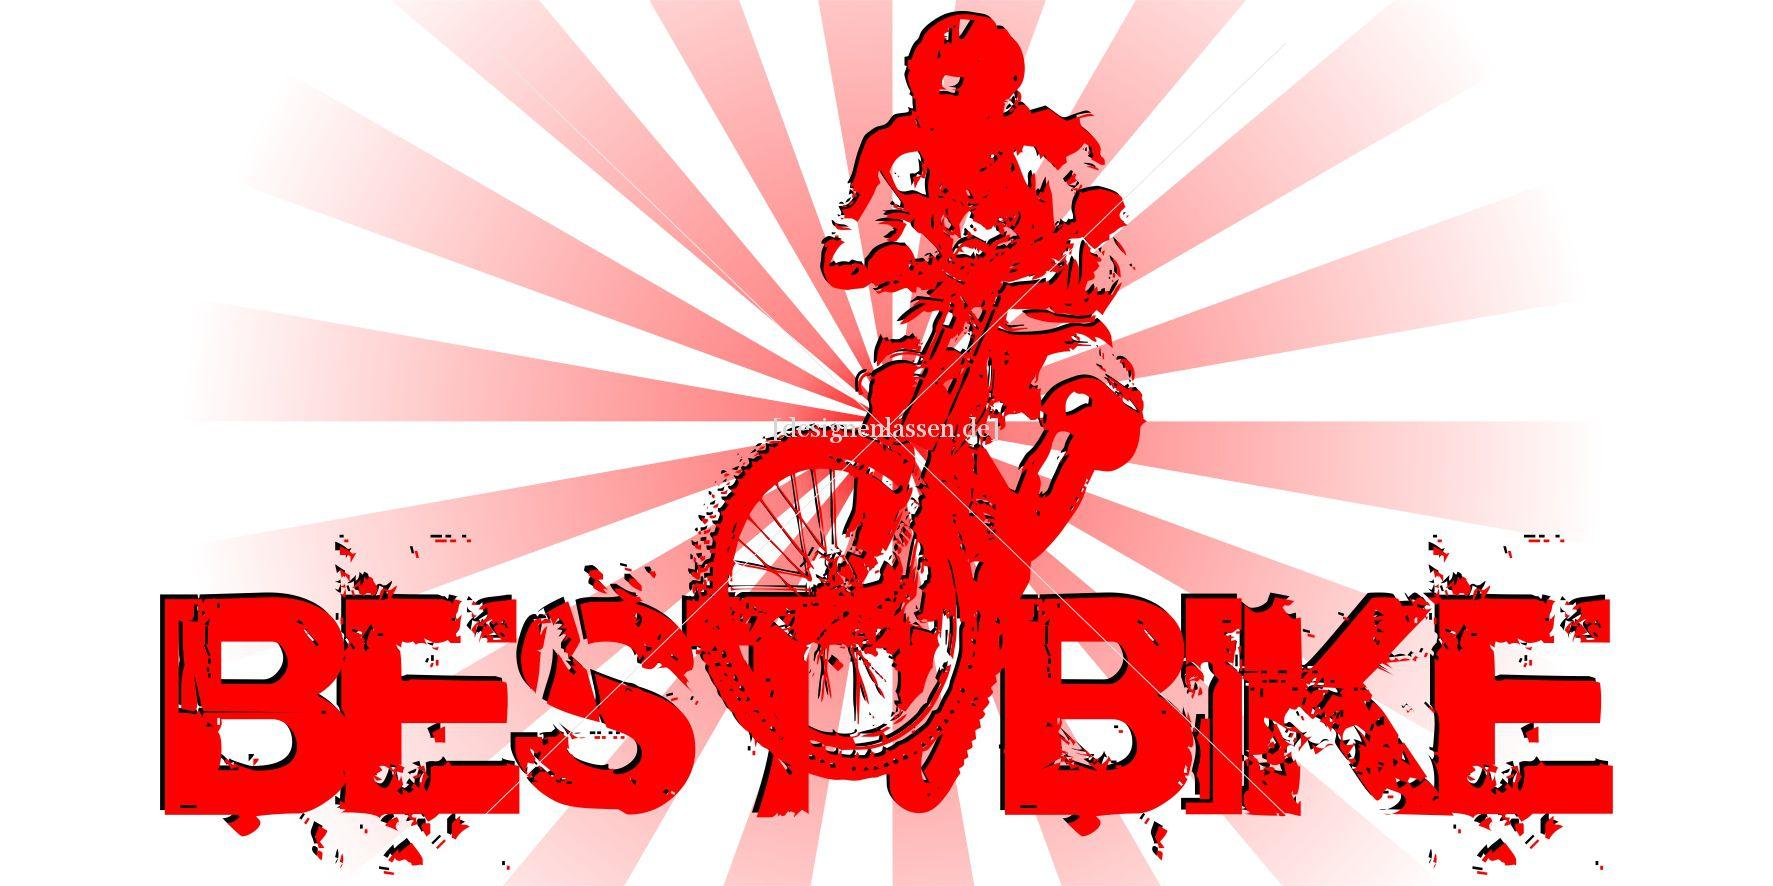 design #31 of BBH